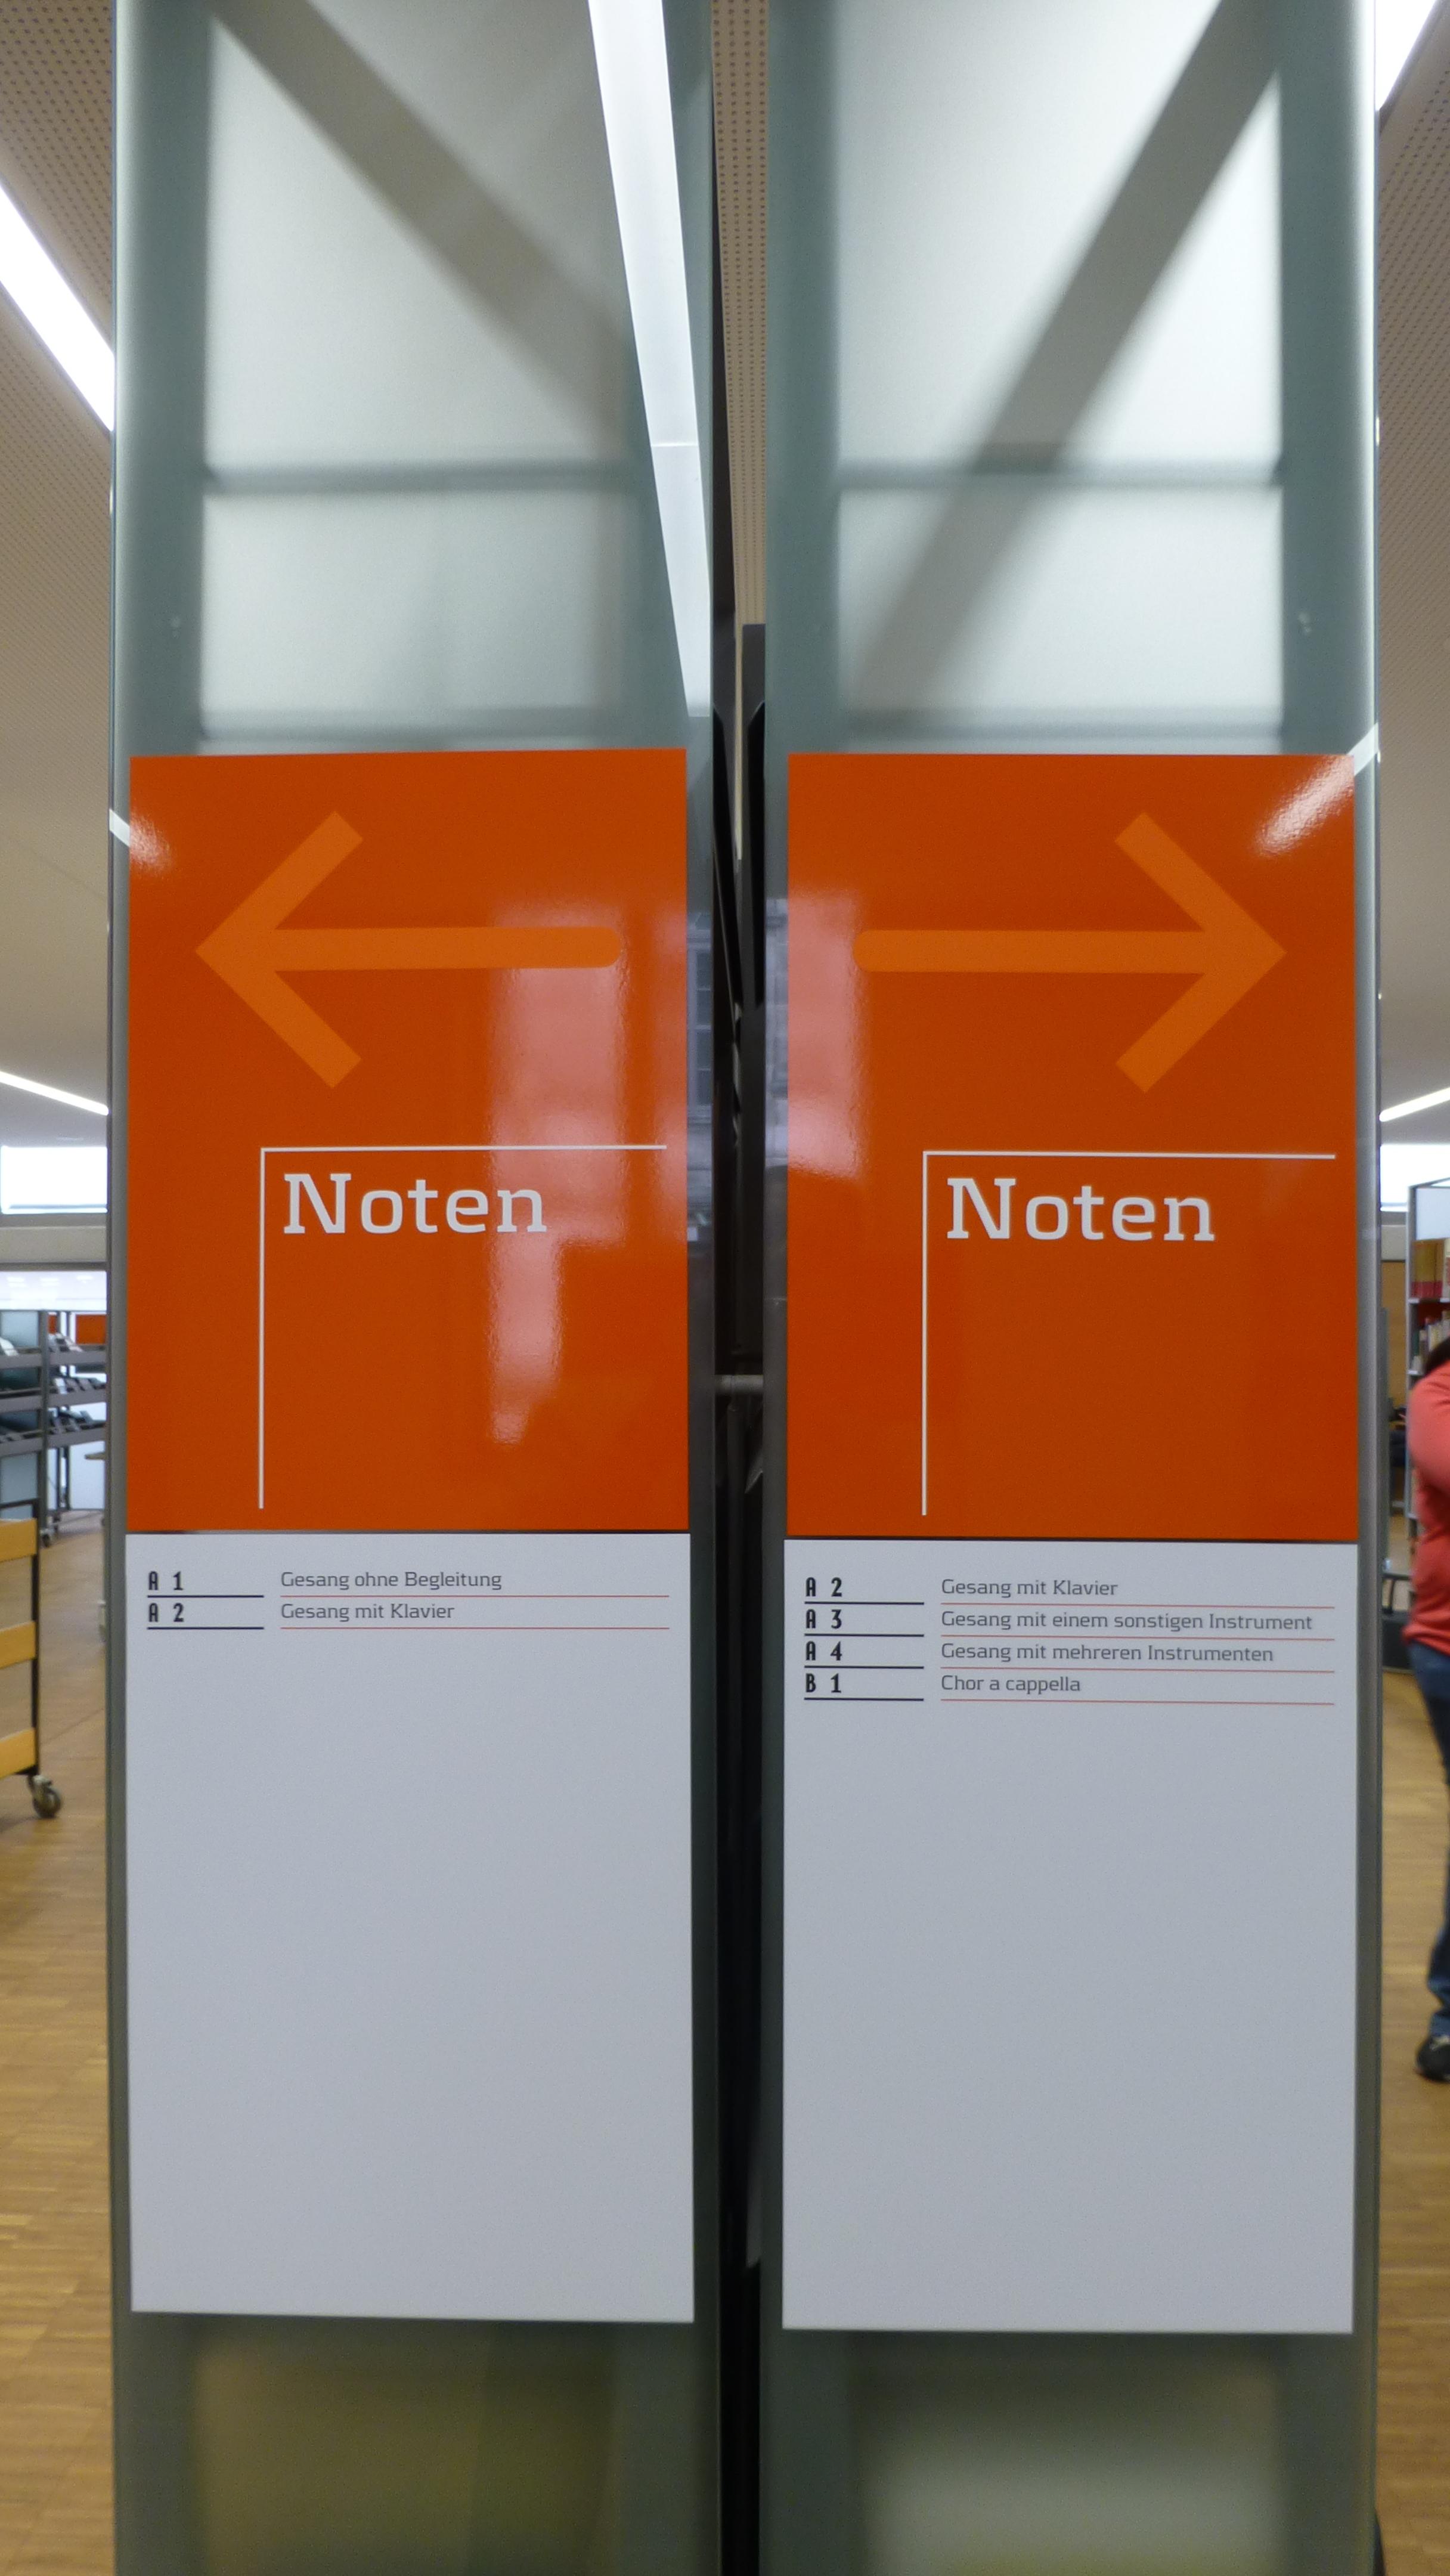 Stadtbibliothek Nürnberg by Manfred Ullrich